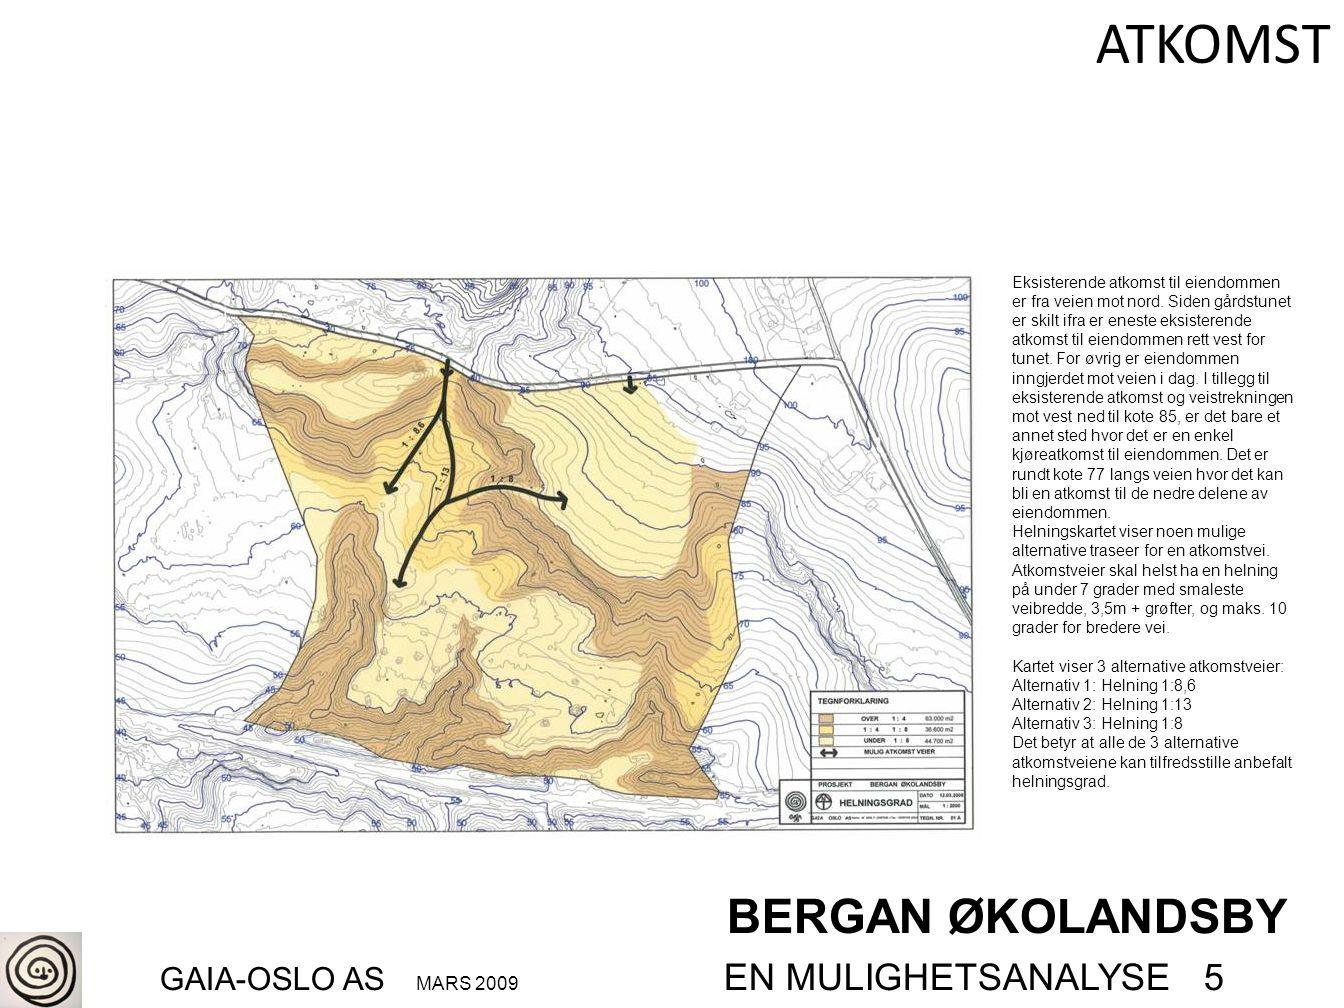 BERGAN ØKOLANDSBY GAIA-OSLO AS MARS 2009 EN MULIGHETSANALYSE 5